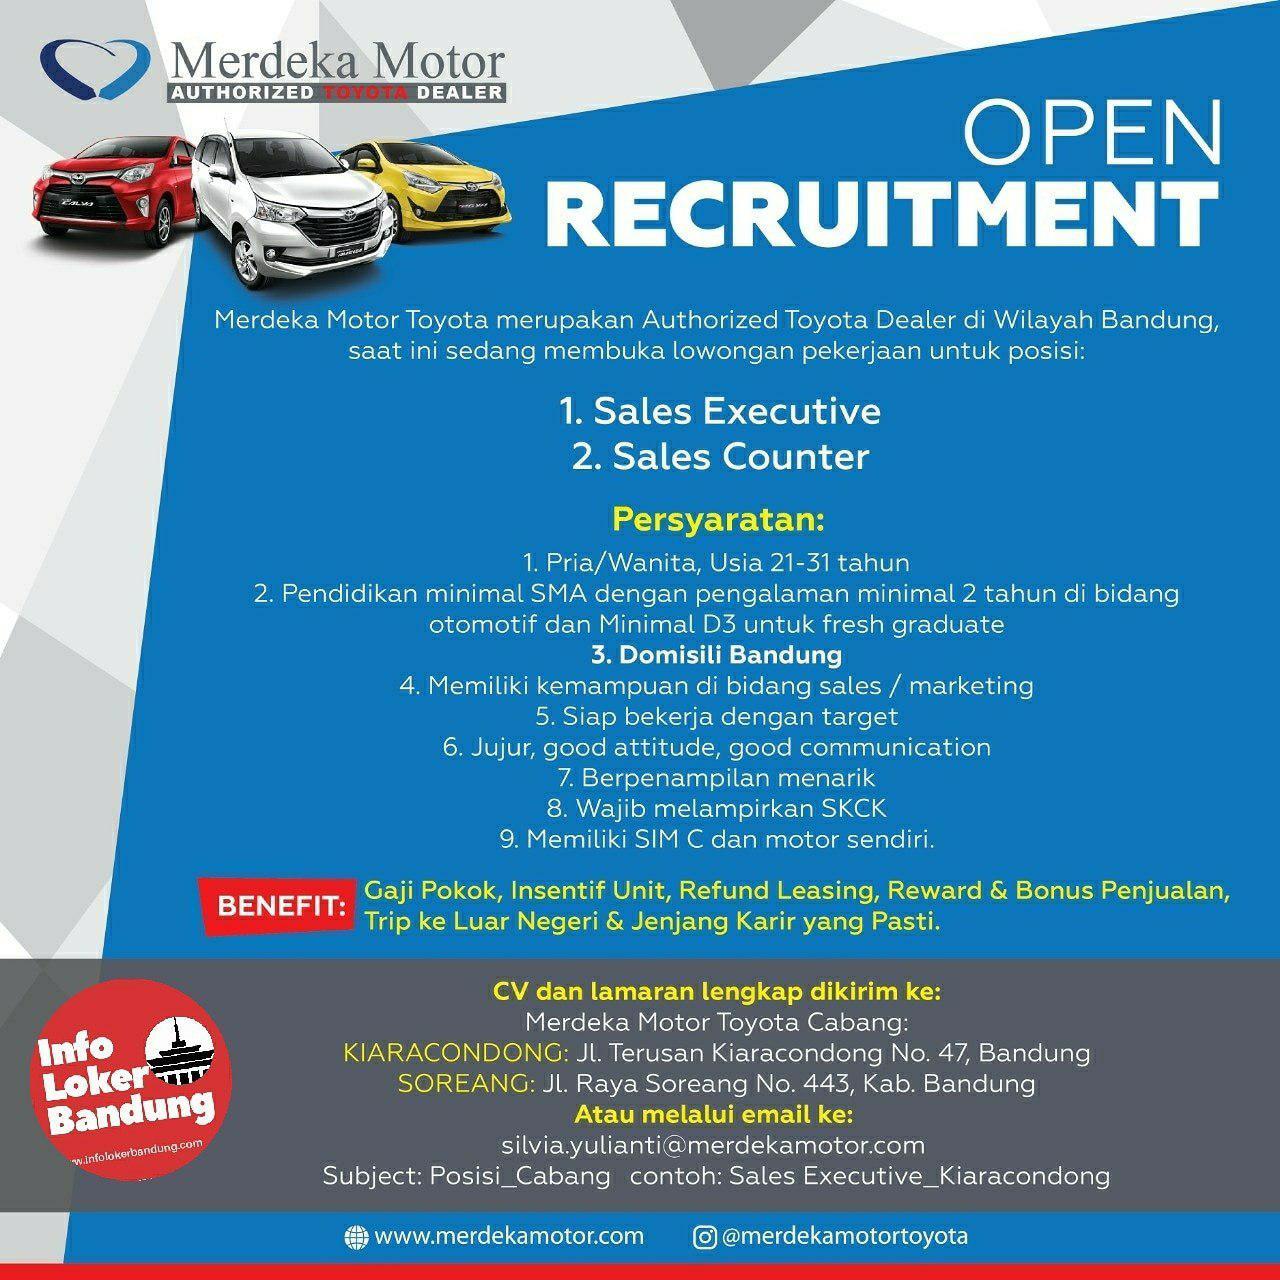 Lowongan Kerja Merdeka Motor Toyota Bandung Januari 2019